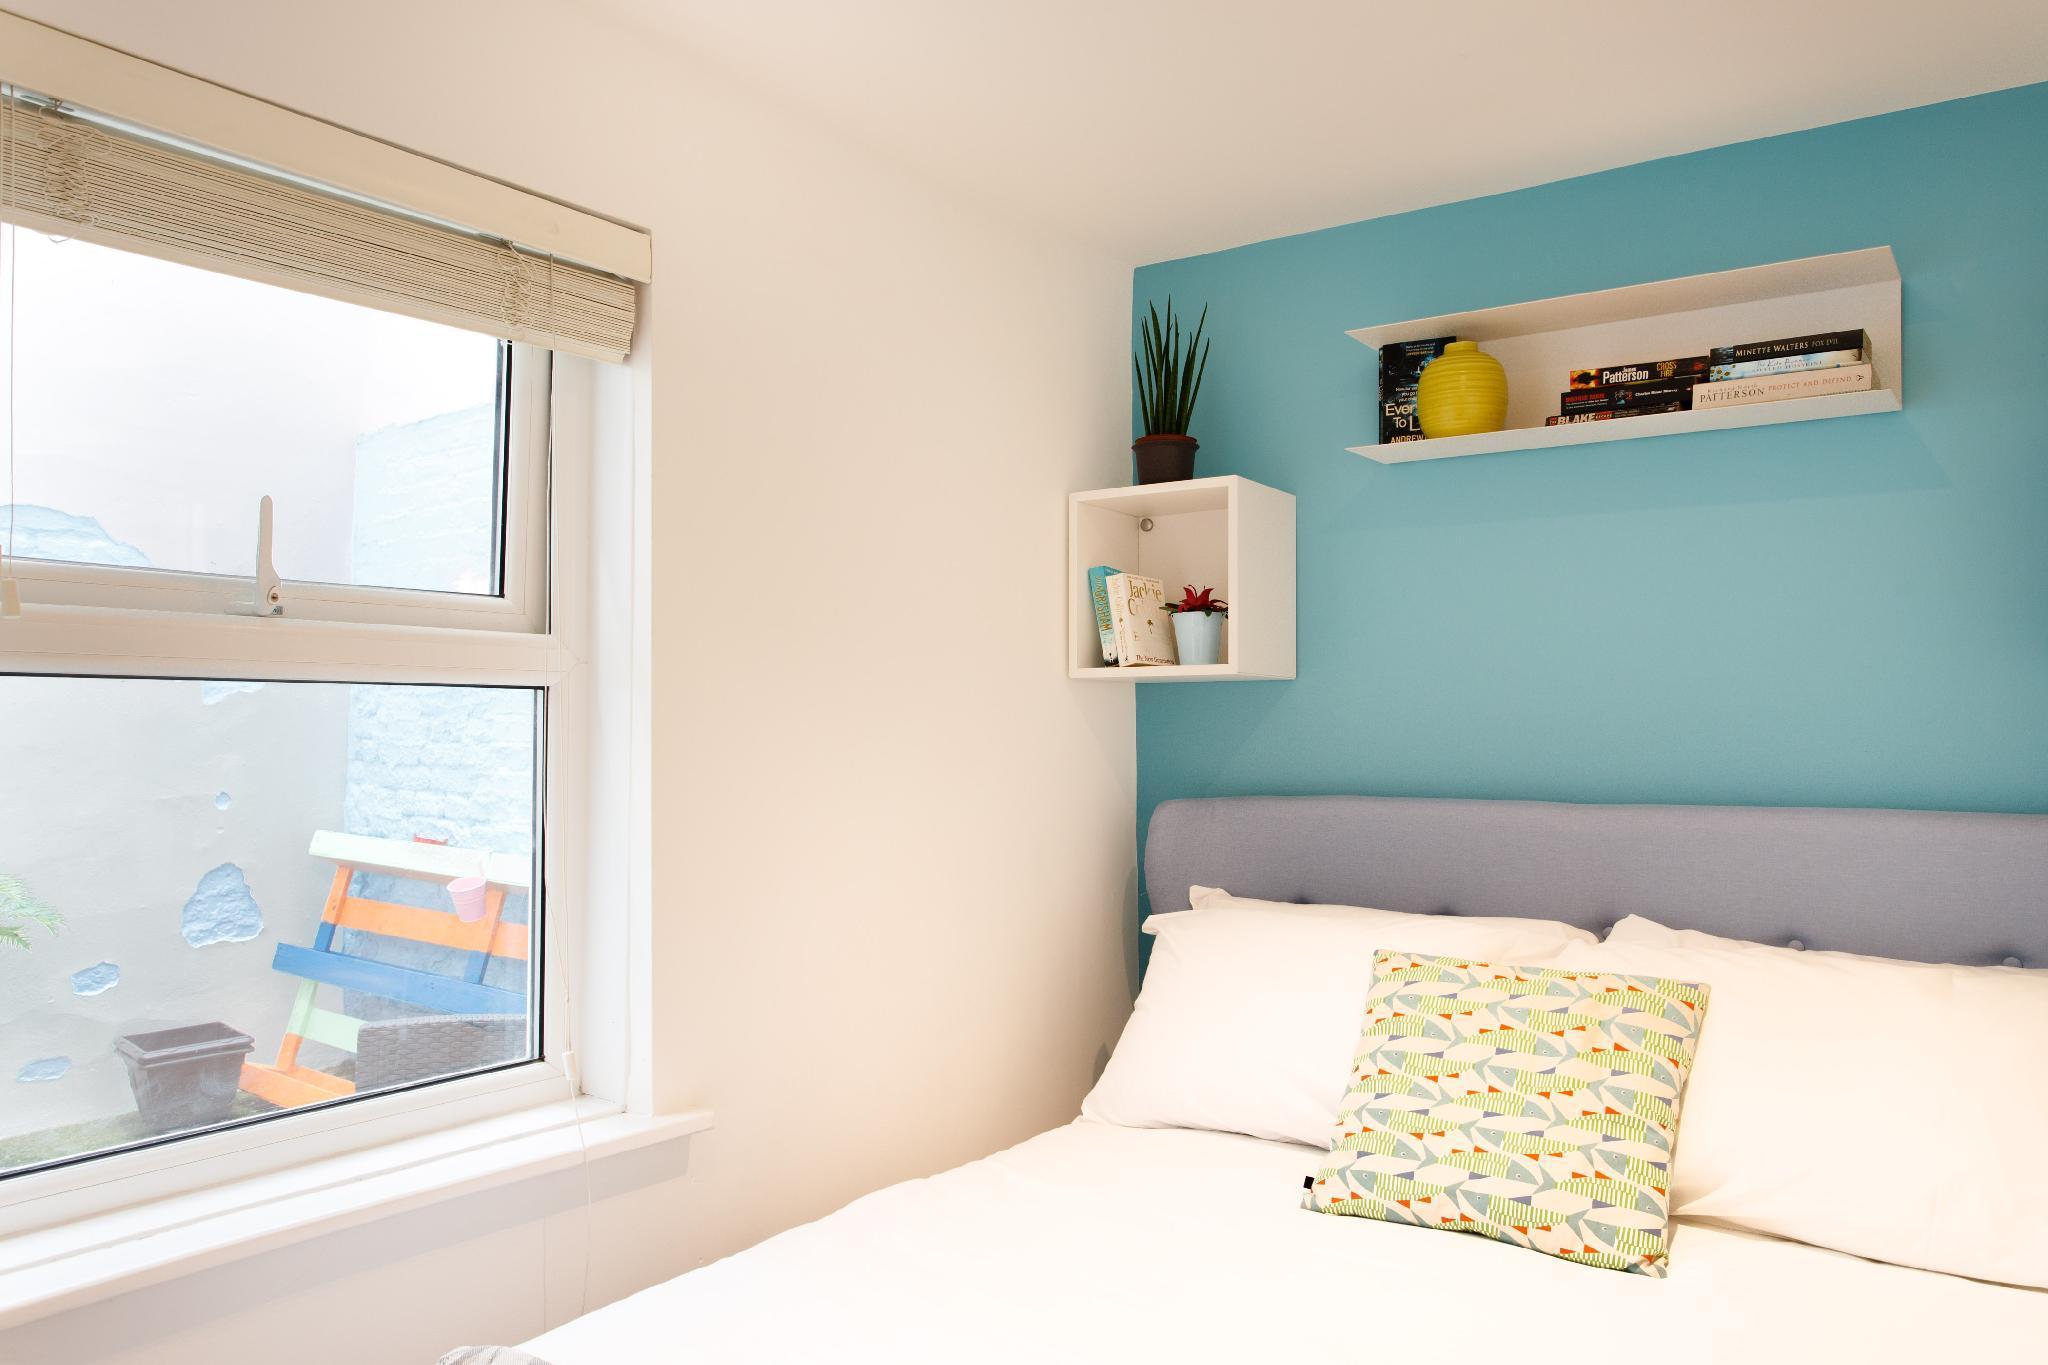 (m02) Beautiful 2Bed patio apartment in Kensington